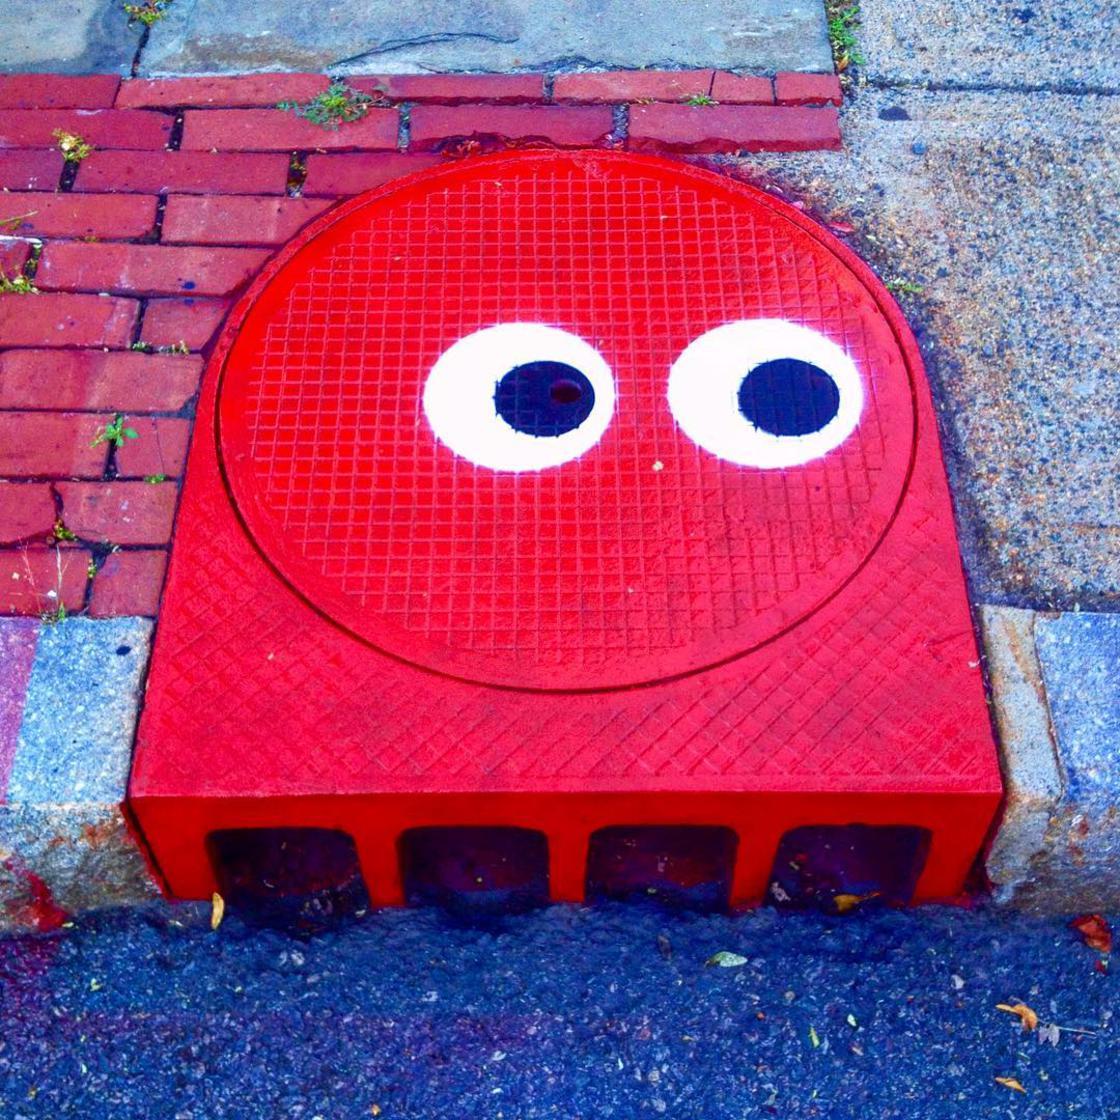 tom-bob-street-art-new-york-4.jpg